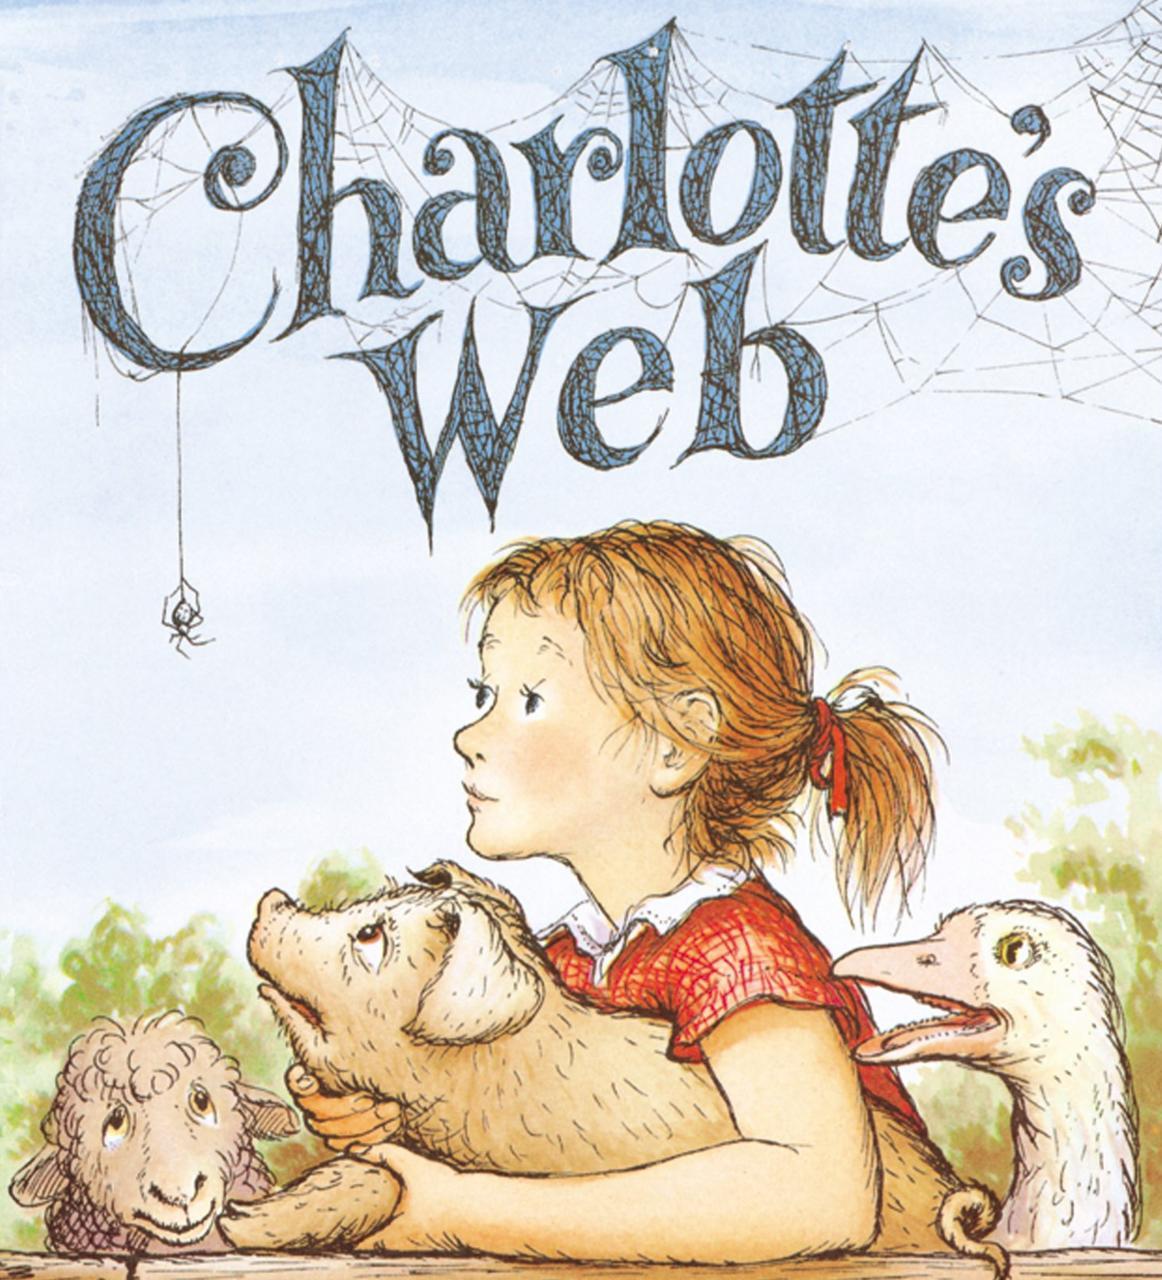 15. Charlotte's Web